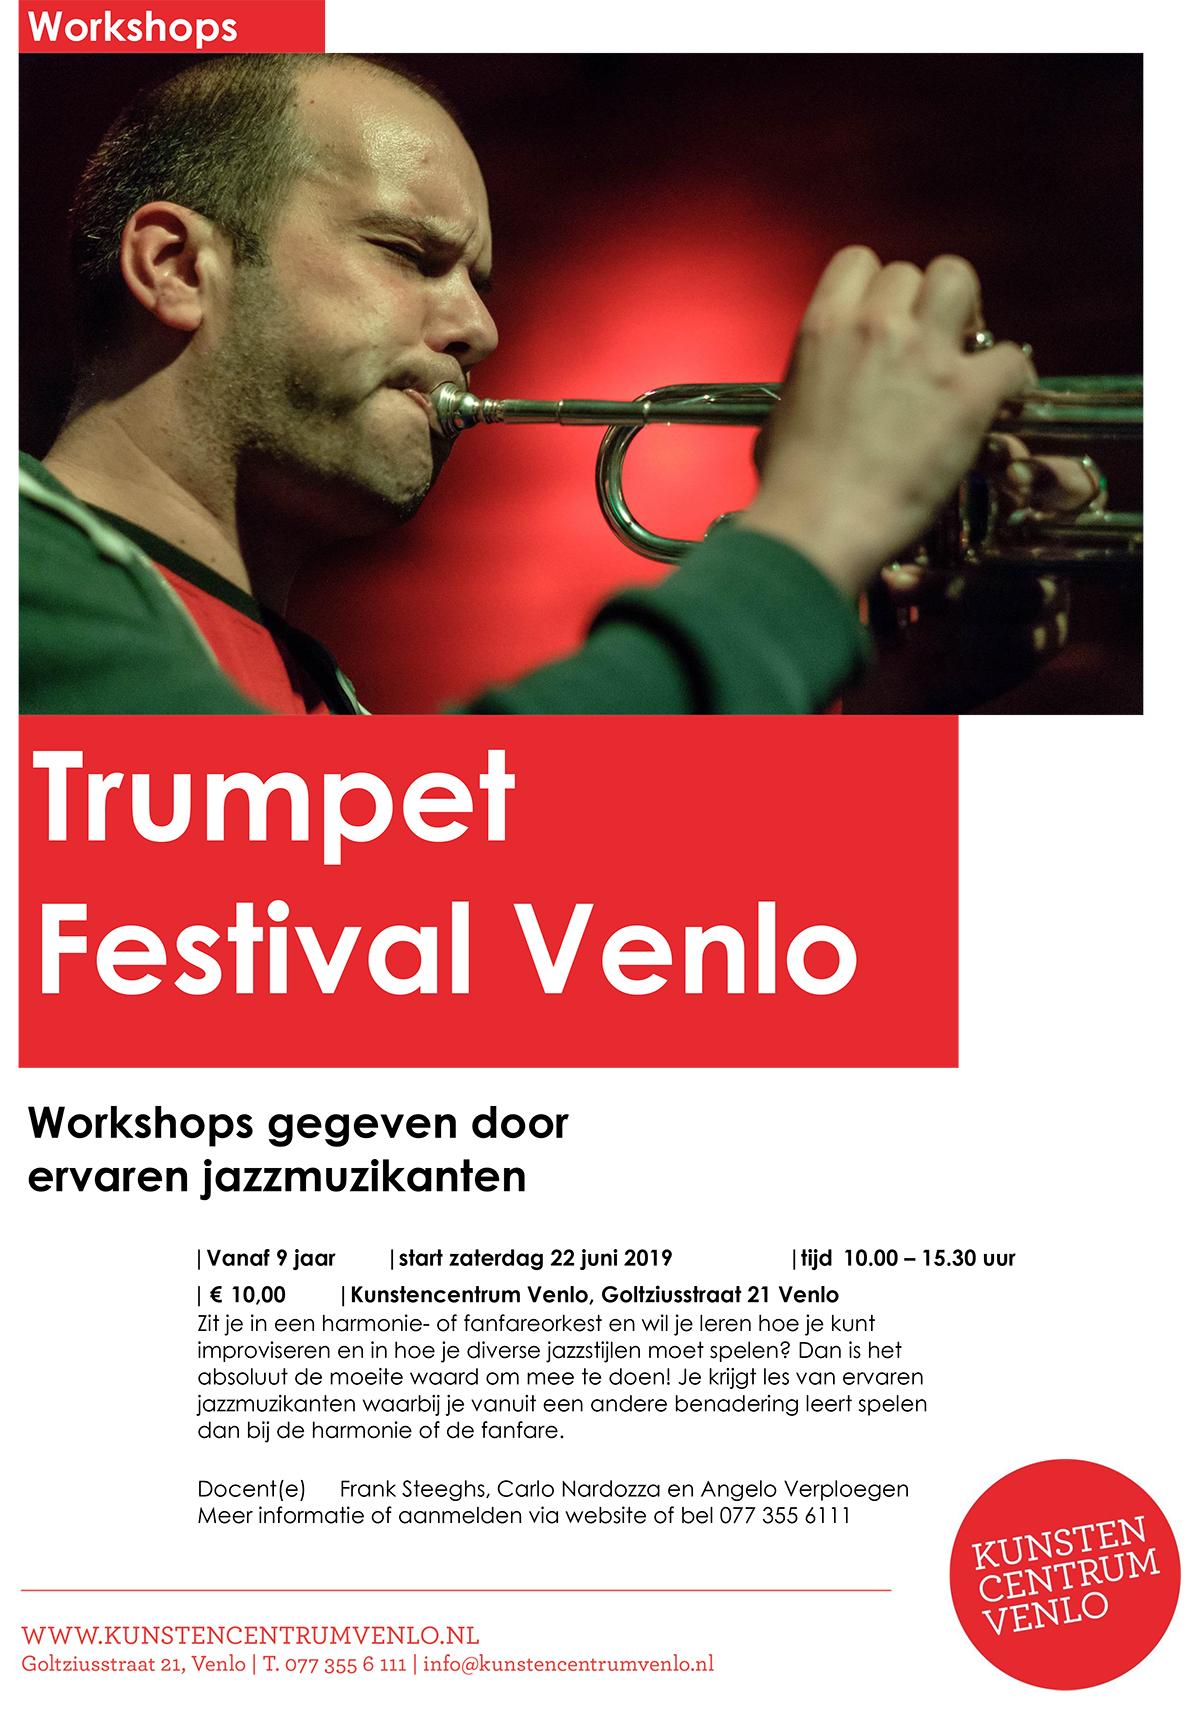 Trumpet Festival Venlo workshops tot 22 juni